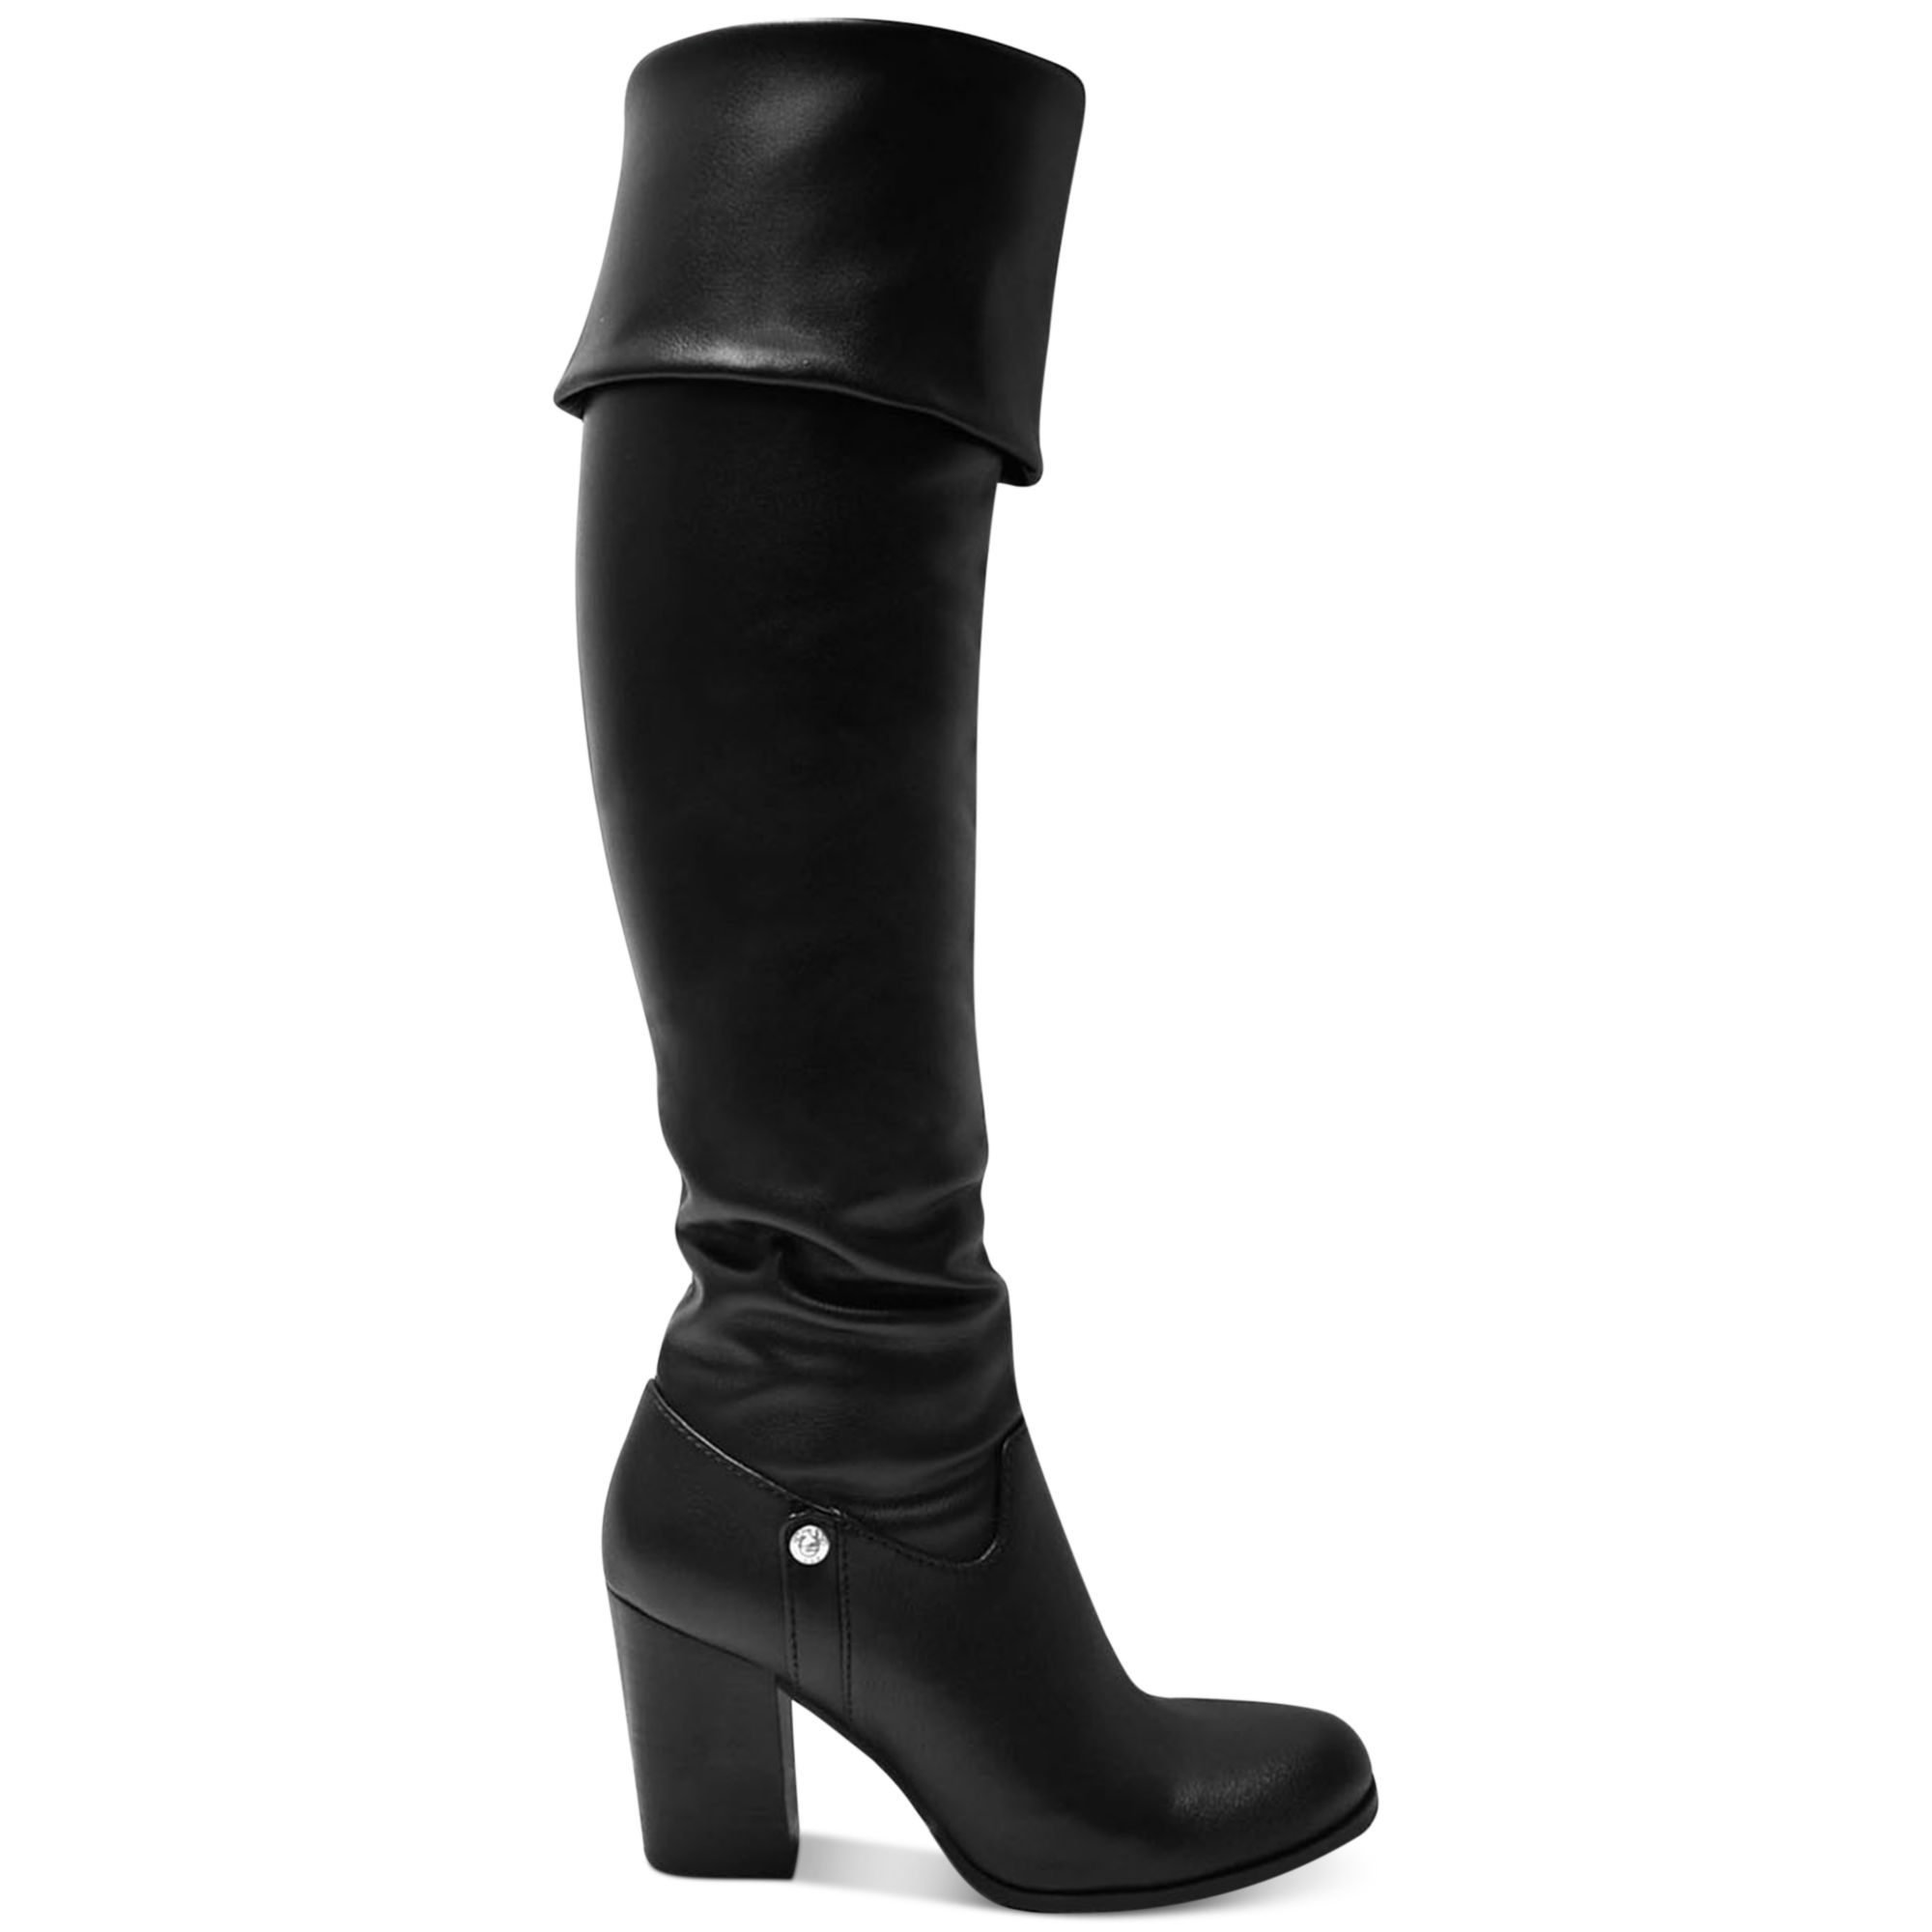 73299e48f74 Lyst - Guess Womens Dandra Boots in Black